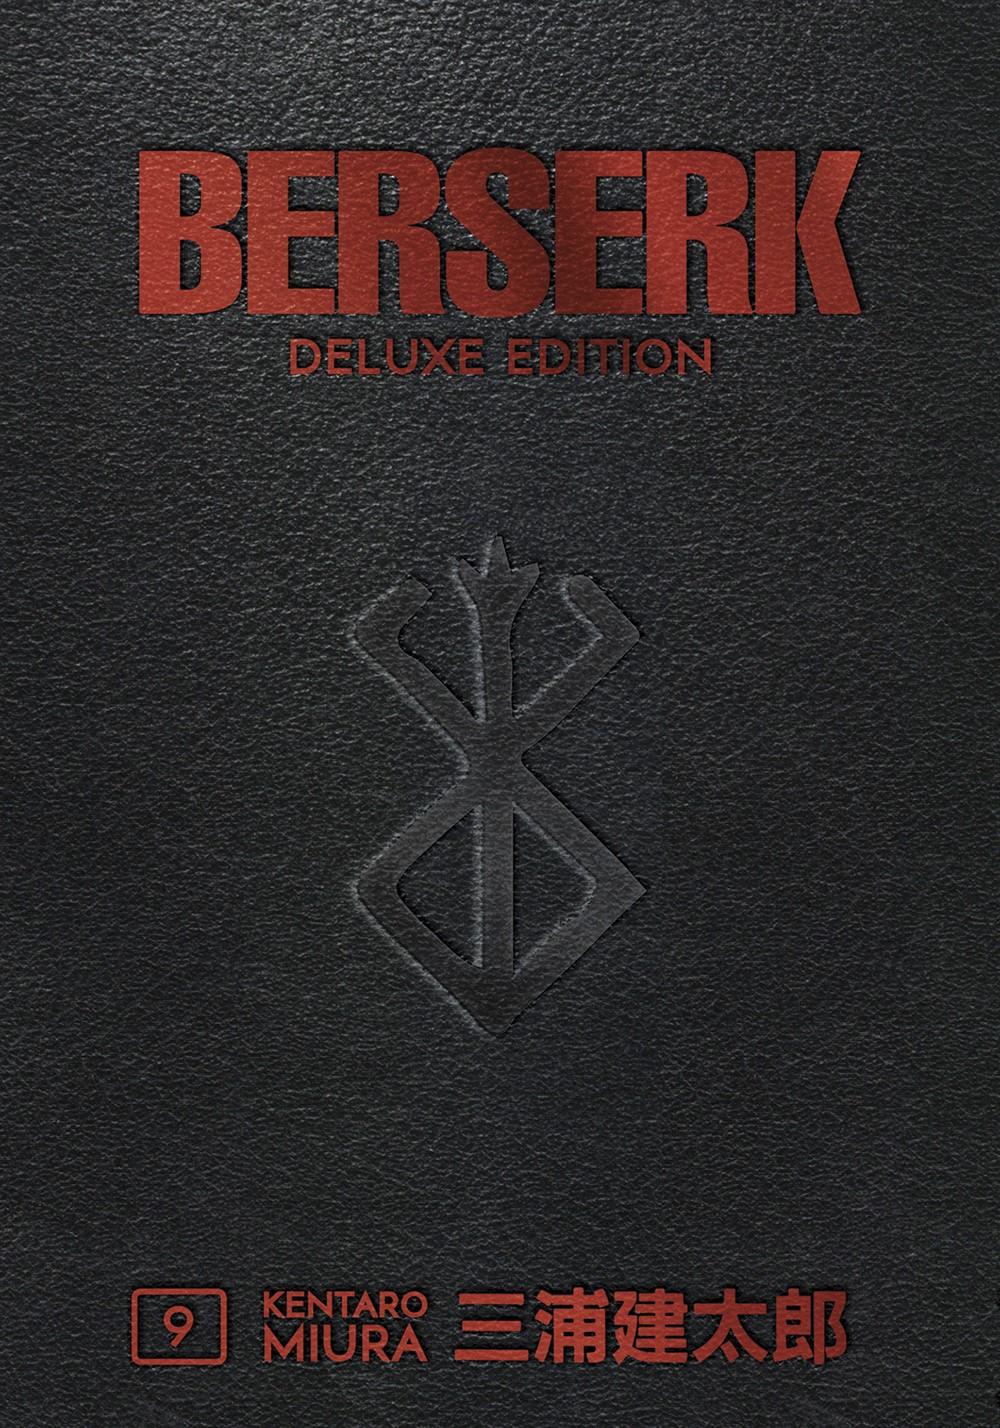 BERSKDEV9_CVR_4x6_FNL Dark Horse Comics September 2021 Solicitations